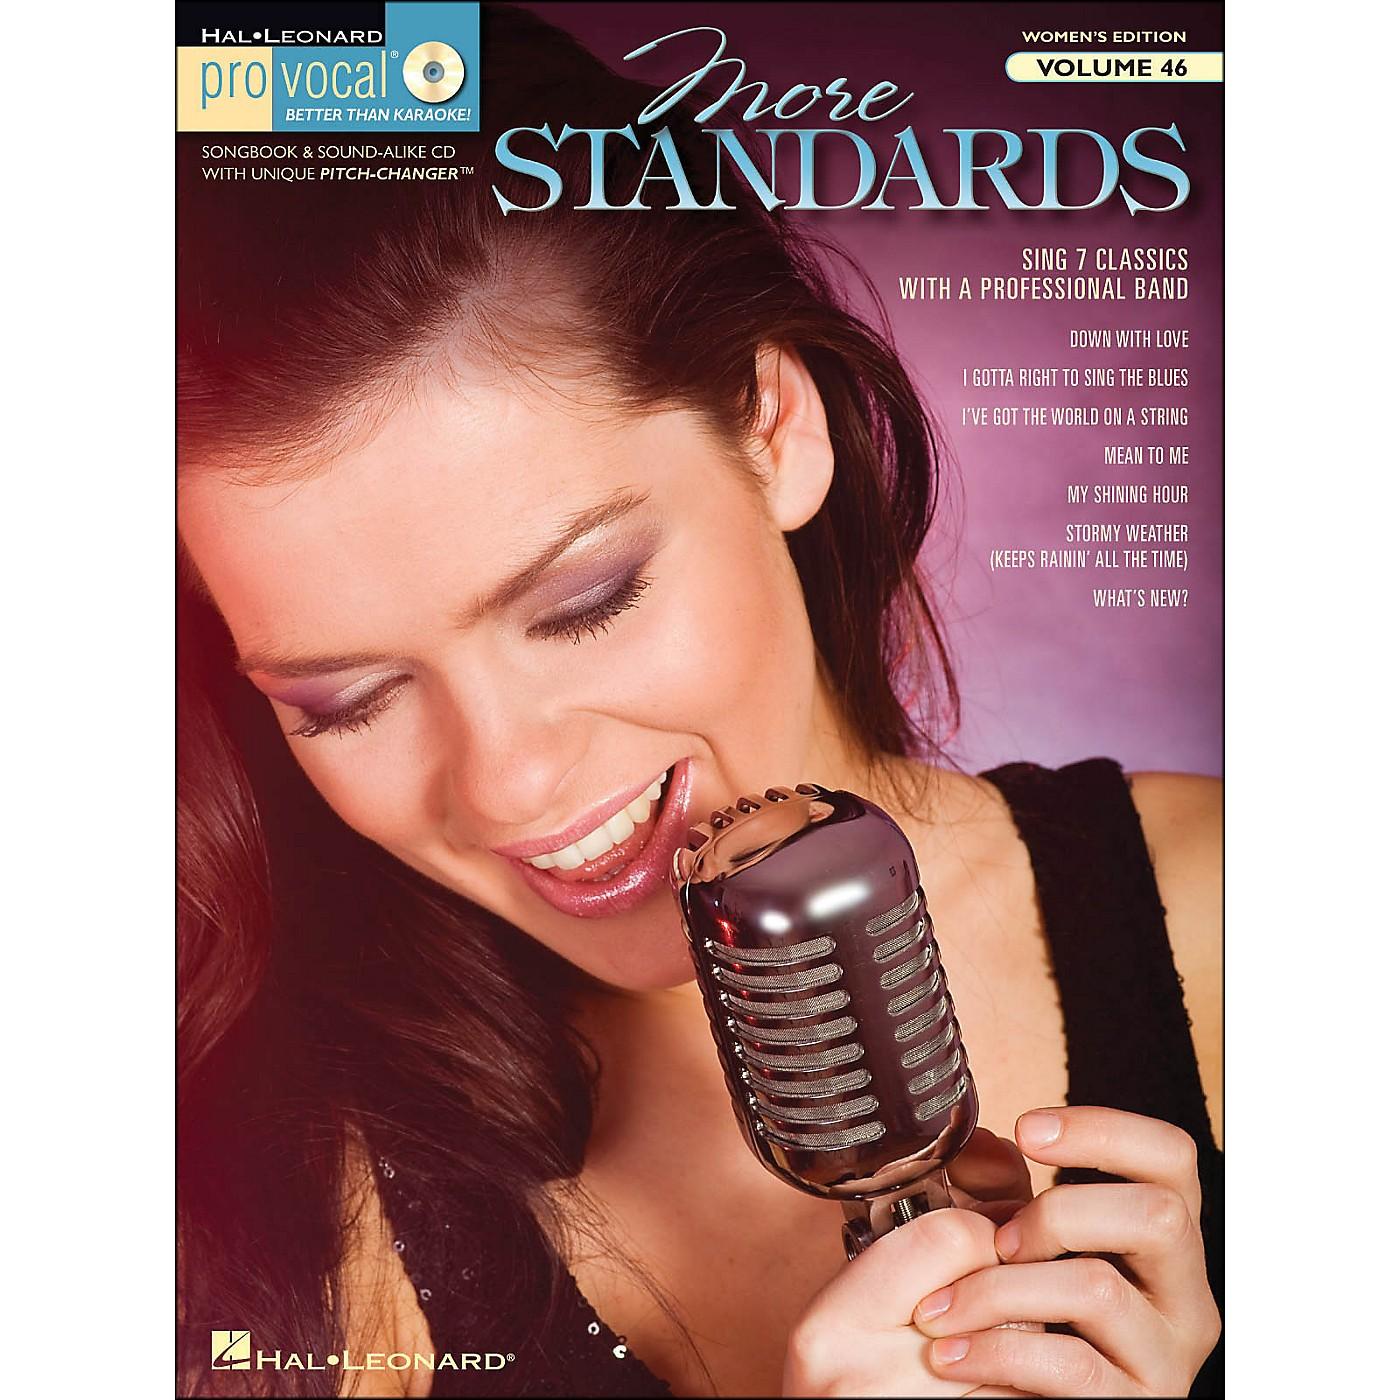 Hal Leonard More Standards - Pro Vocal Songbook & CD for Female Singers Volume 46 thumbnail